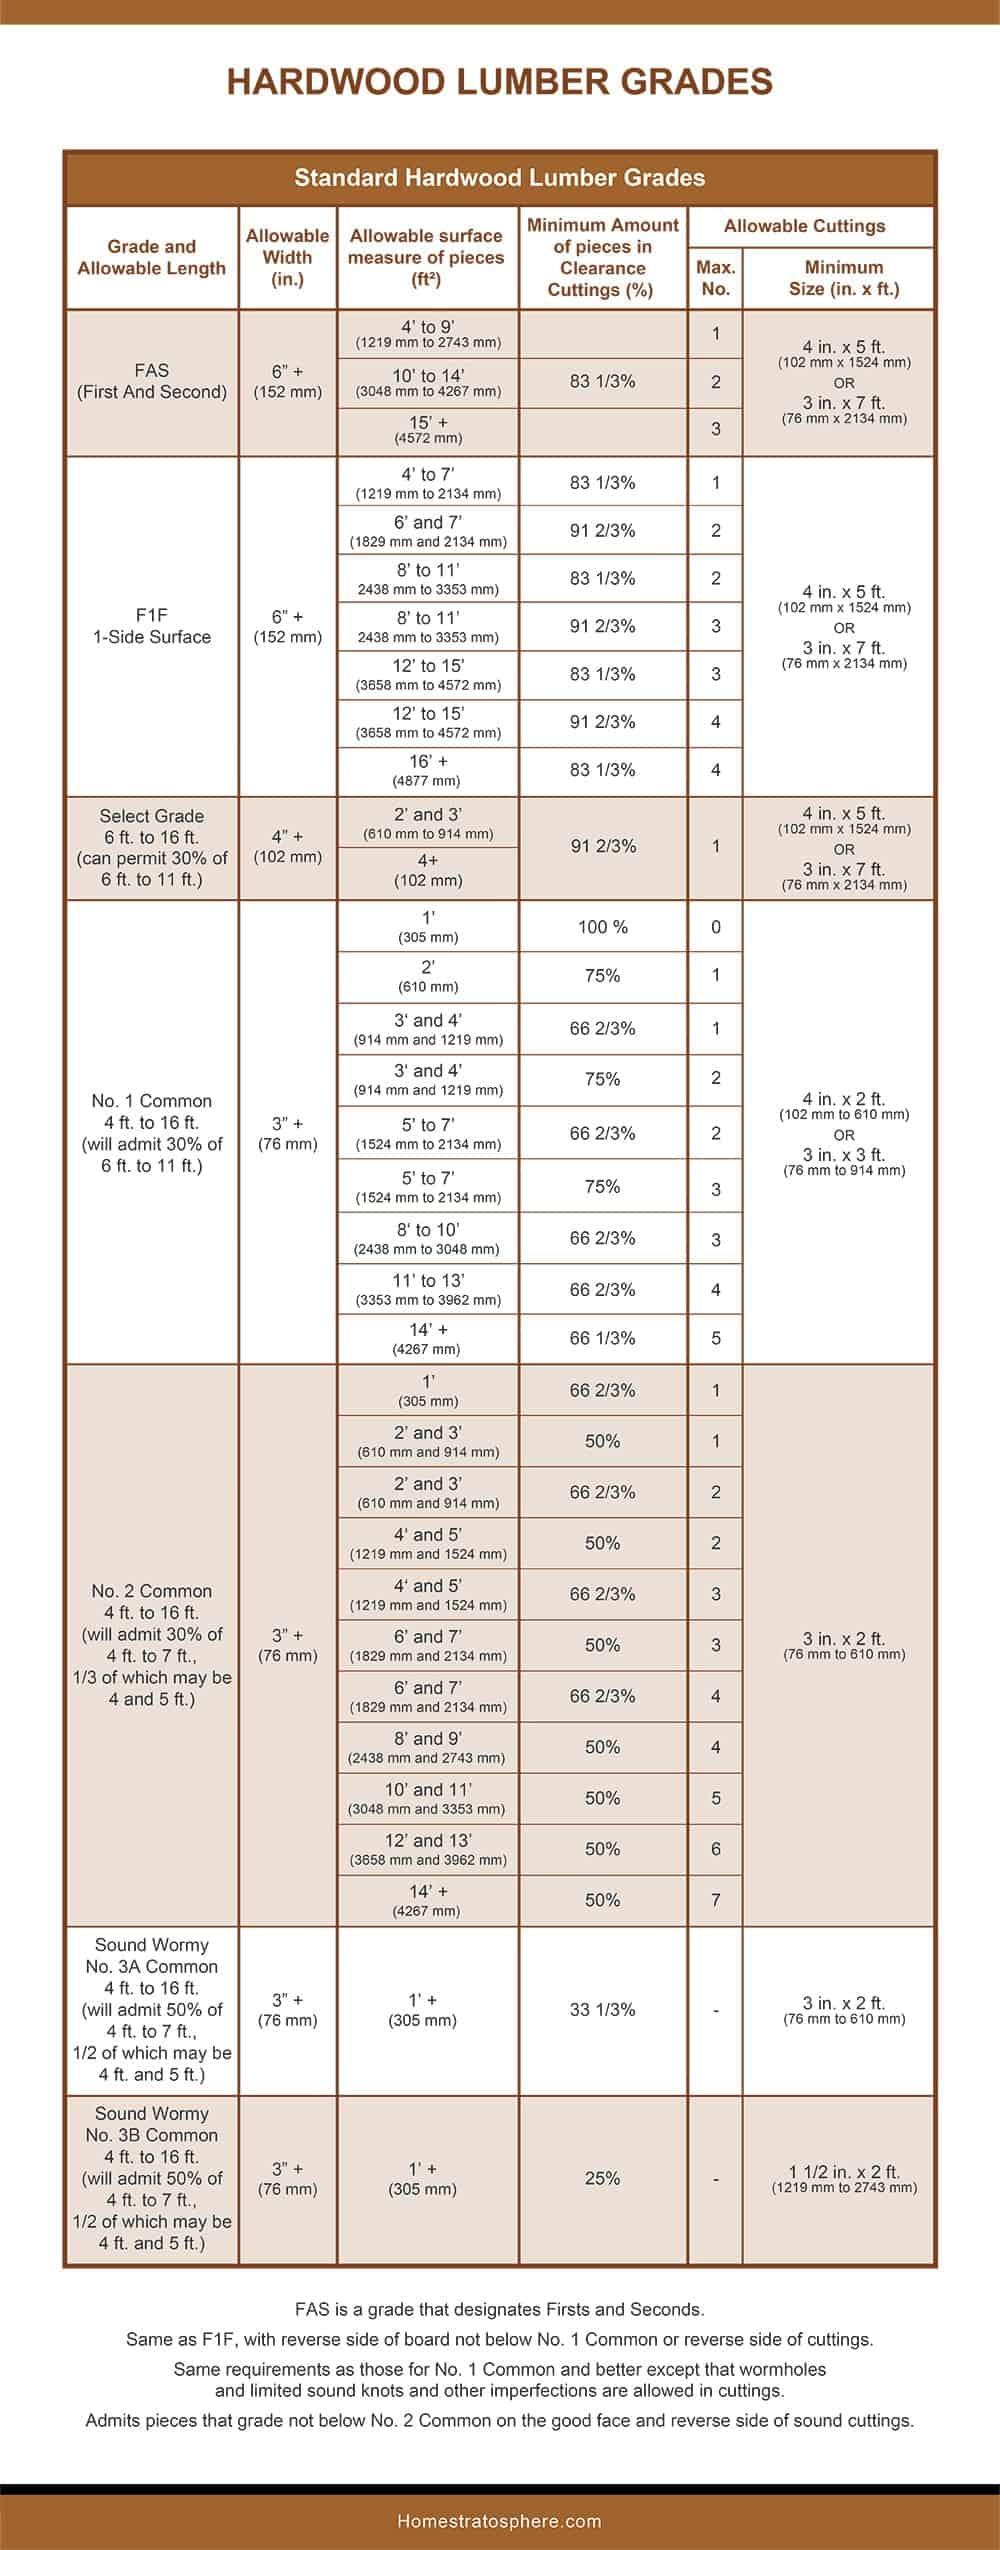 Standard Hardwood Lumber Grades